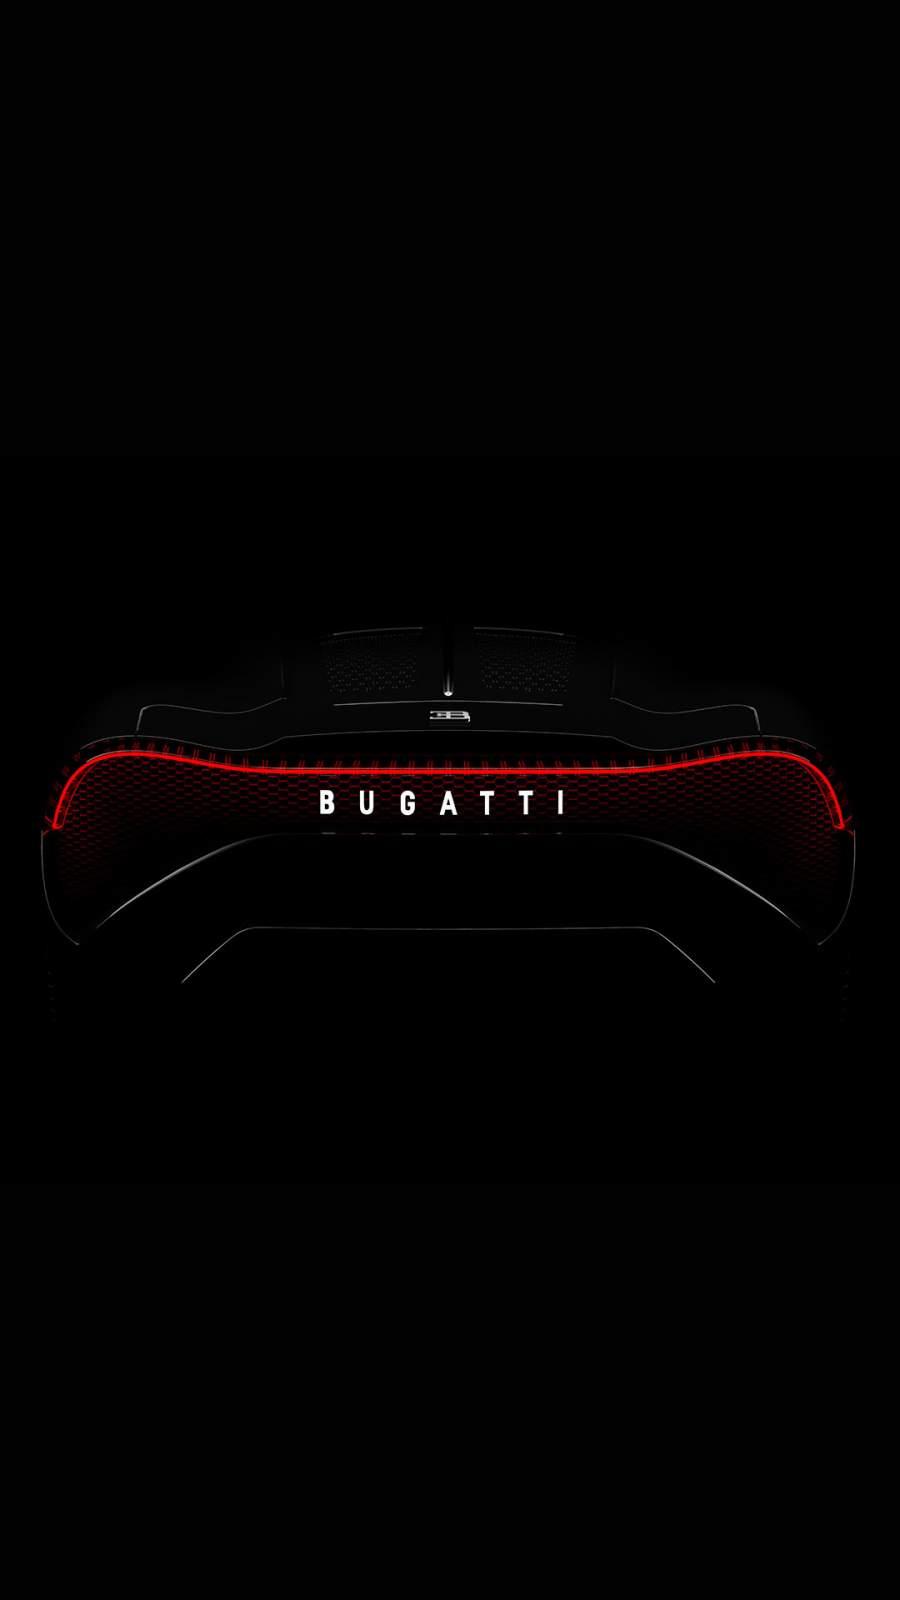 Bugatti Lights iPhone Wallpaper